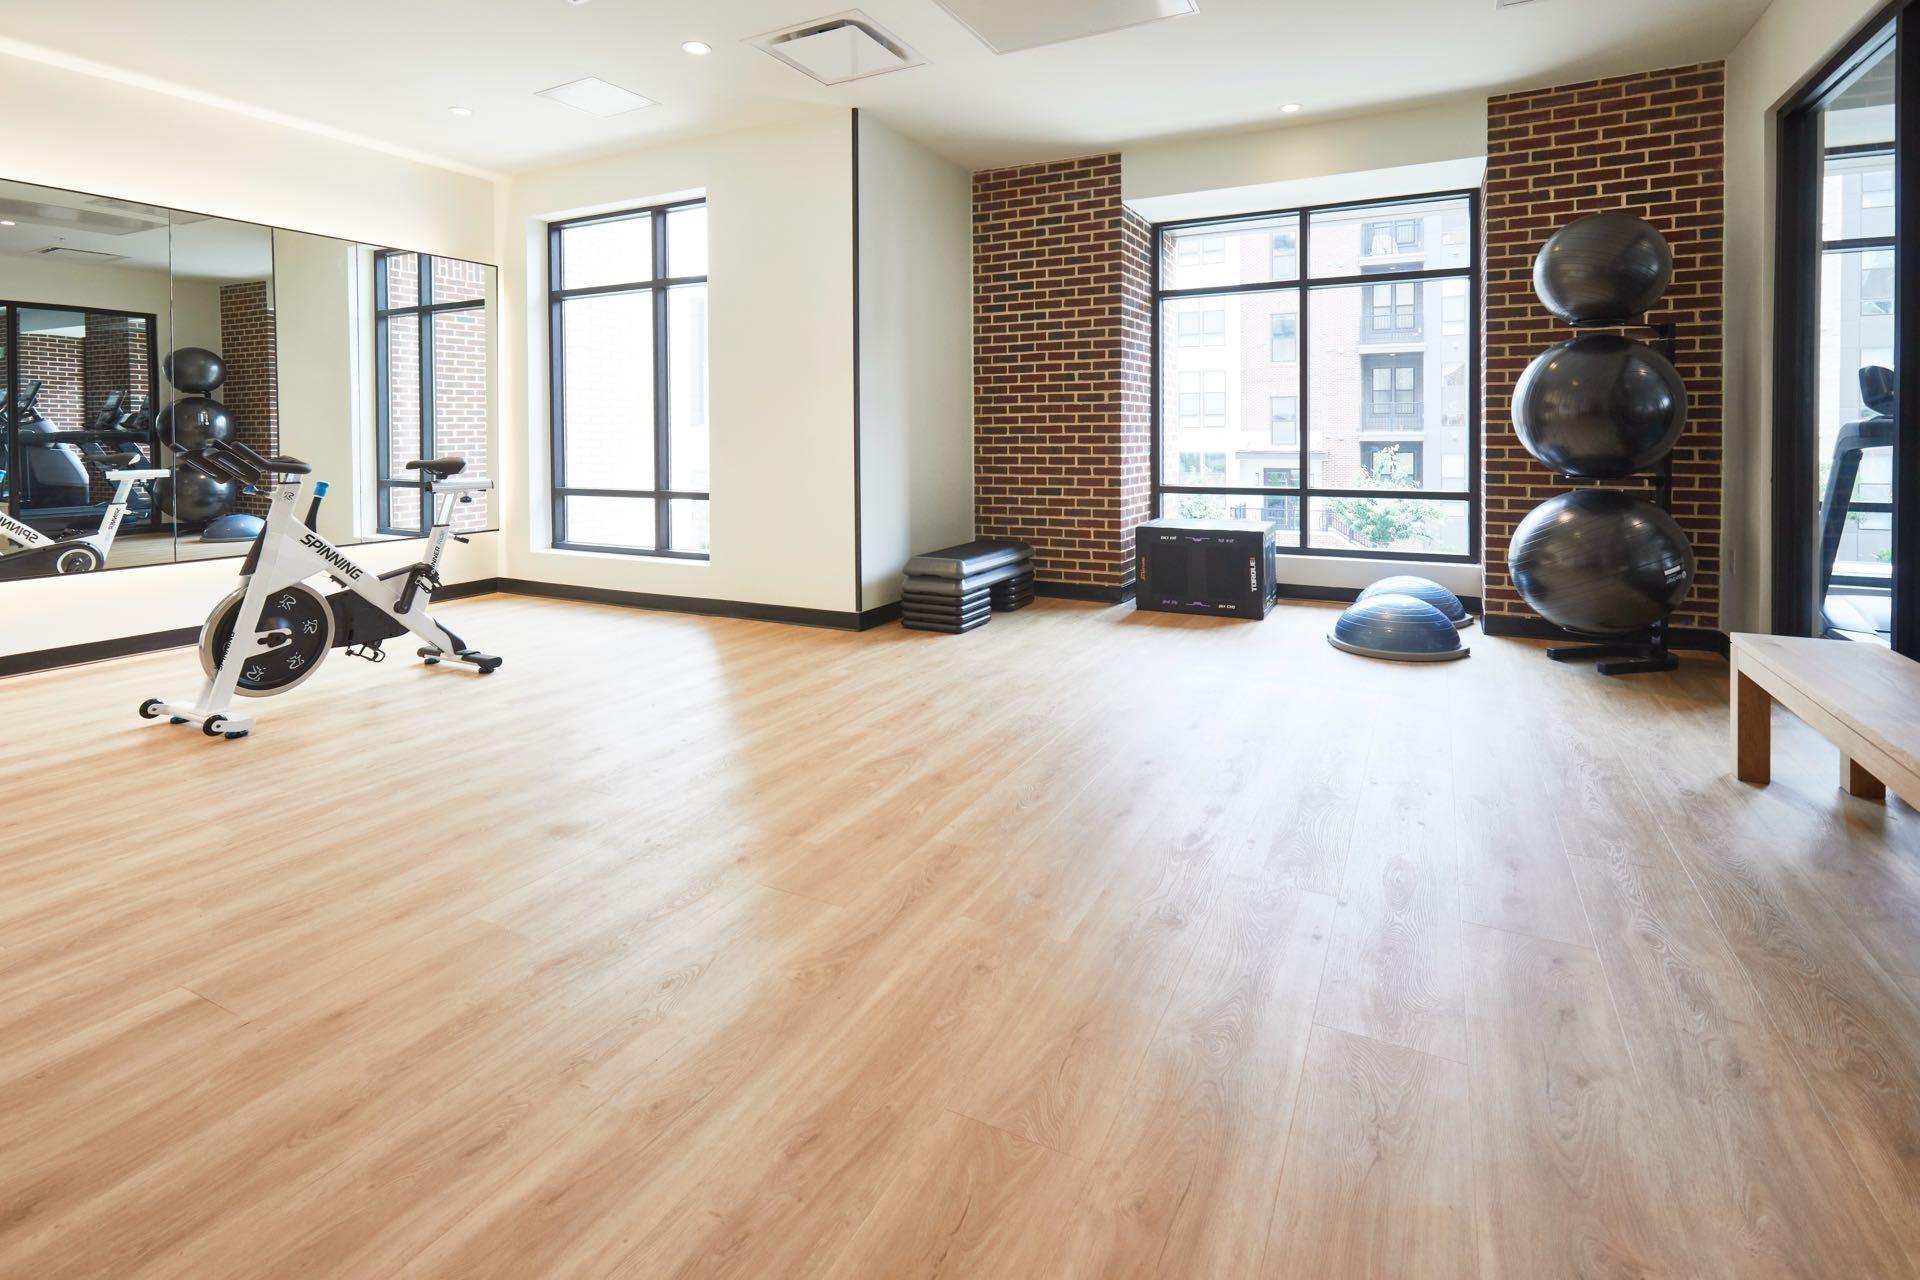 Amenity_FitnessCenter2